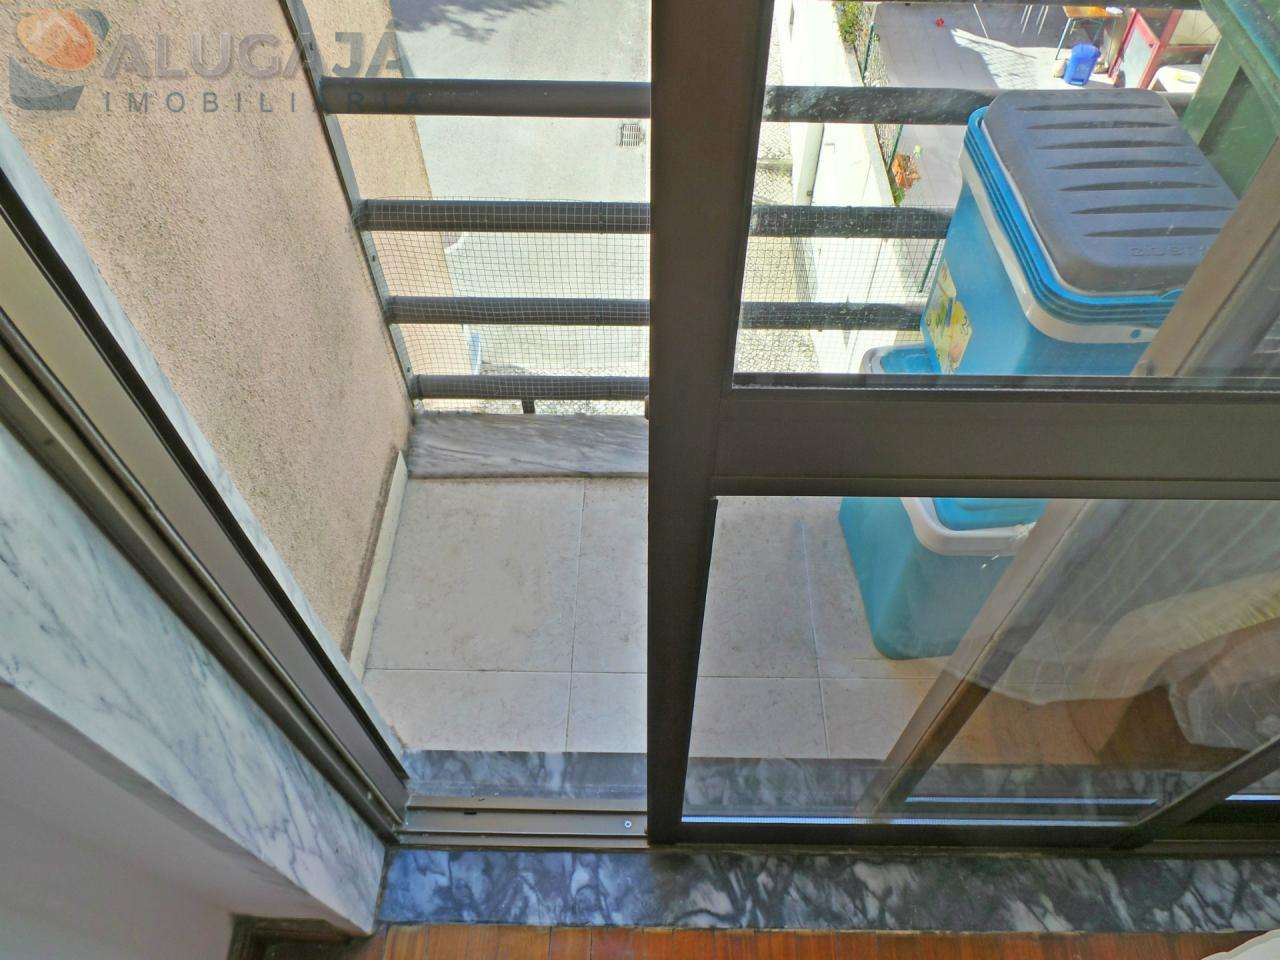 Apartamento para comprar, Vialonga, Vila Franca de Xira, Lisboa - Foto 19